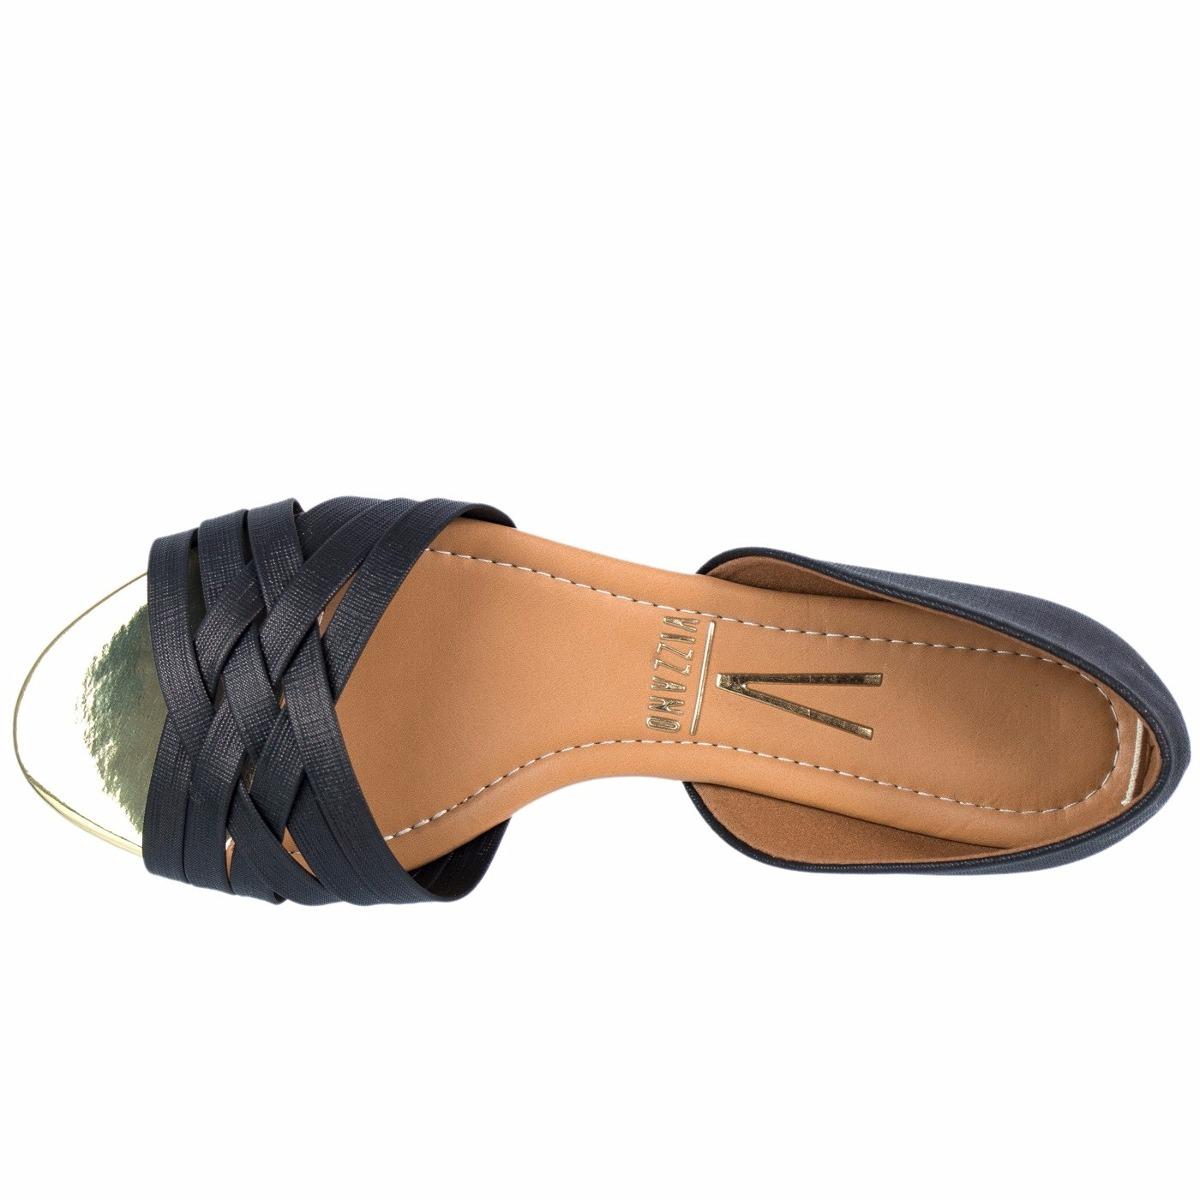 dec93ae8ab sandália rasteira vizzano napa metal feminina 1834.103. Carregando zoom.